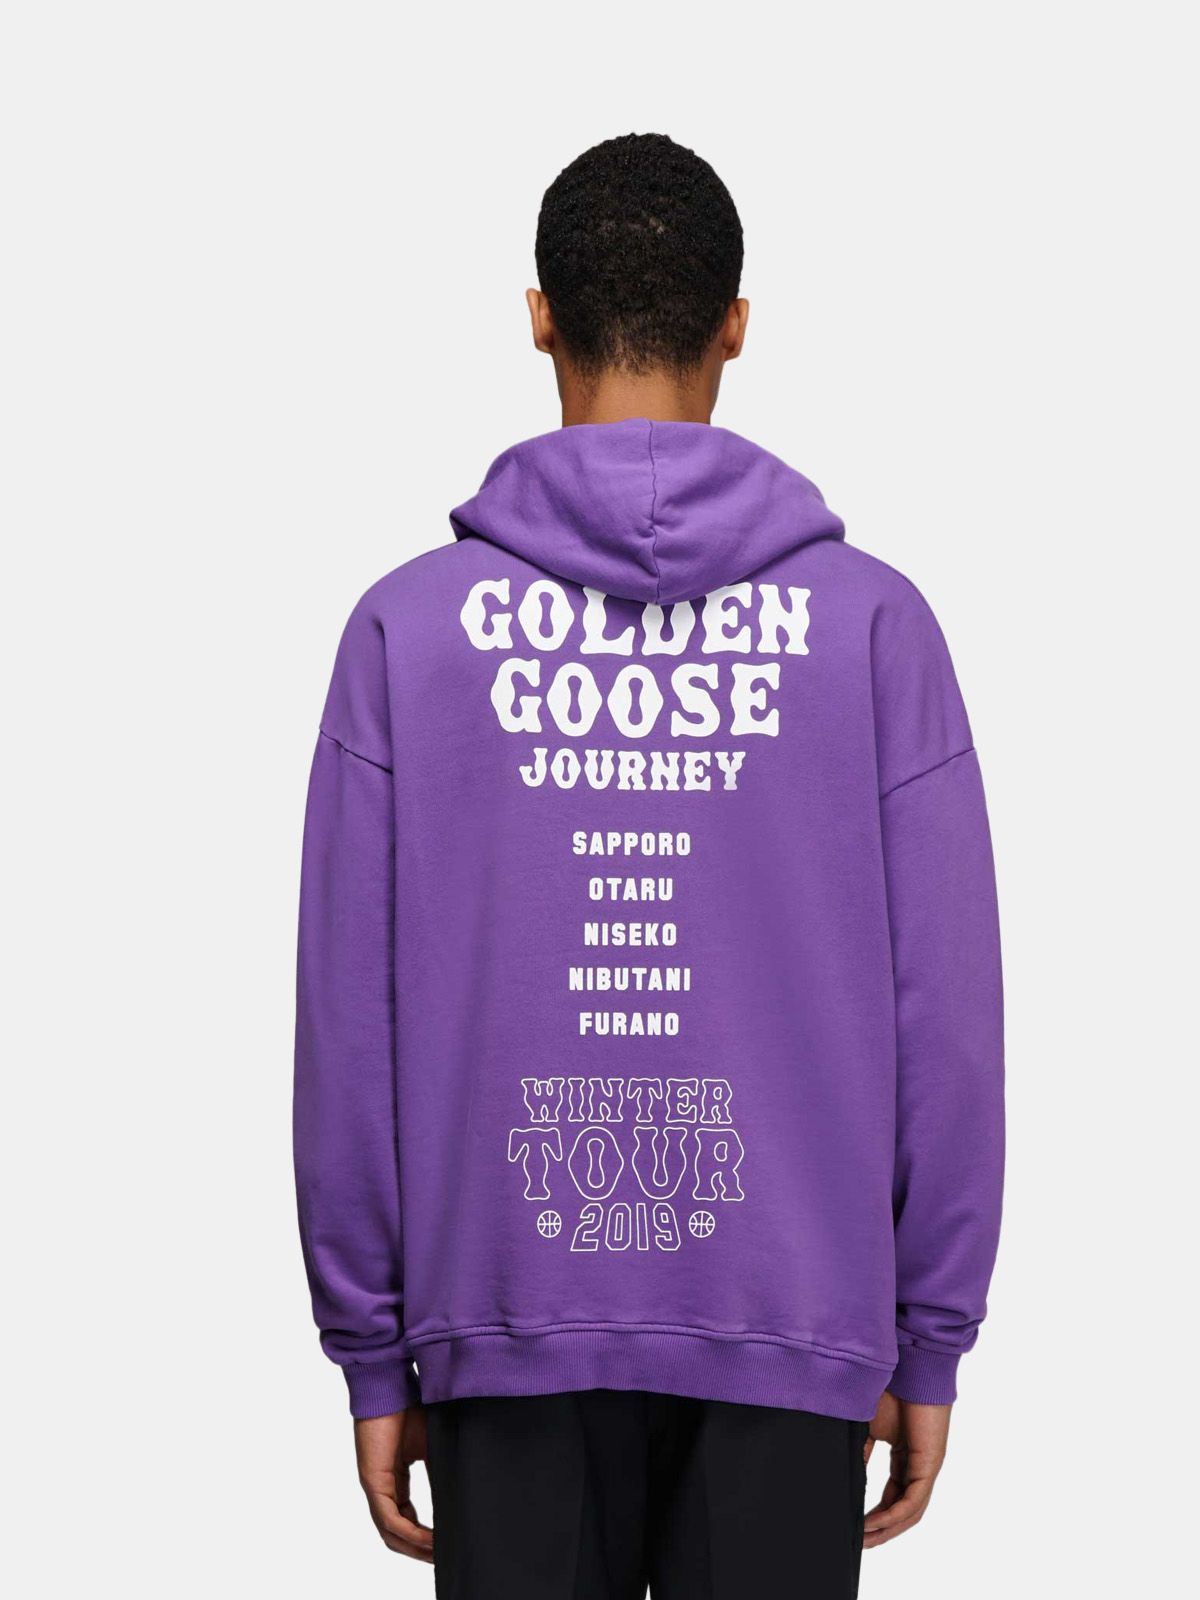 Golden Goose - Felpa Hokkaido Travel Guide in